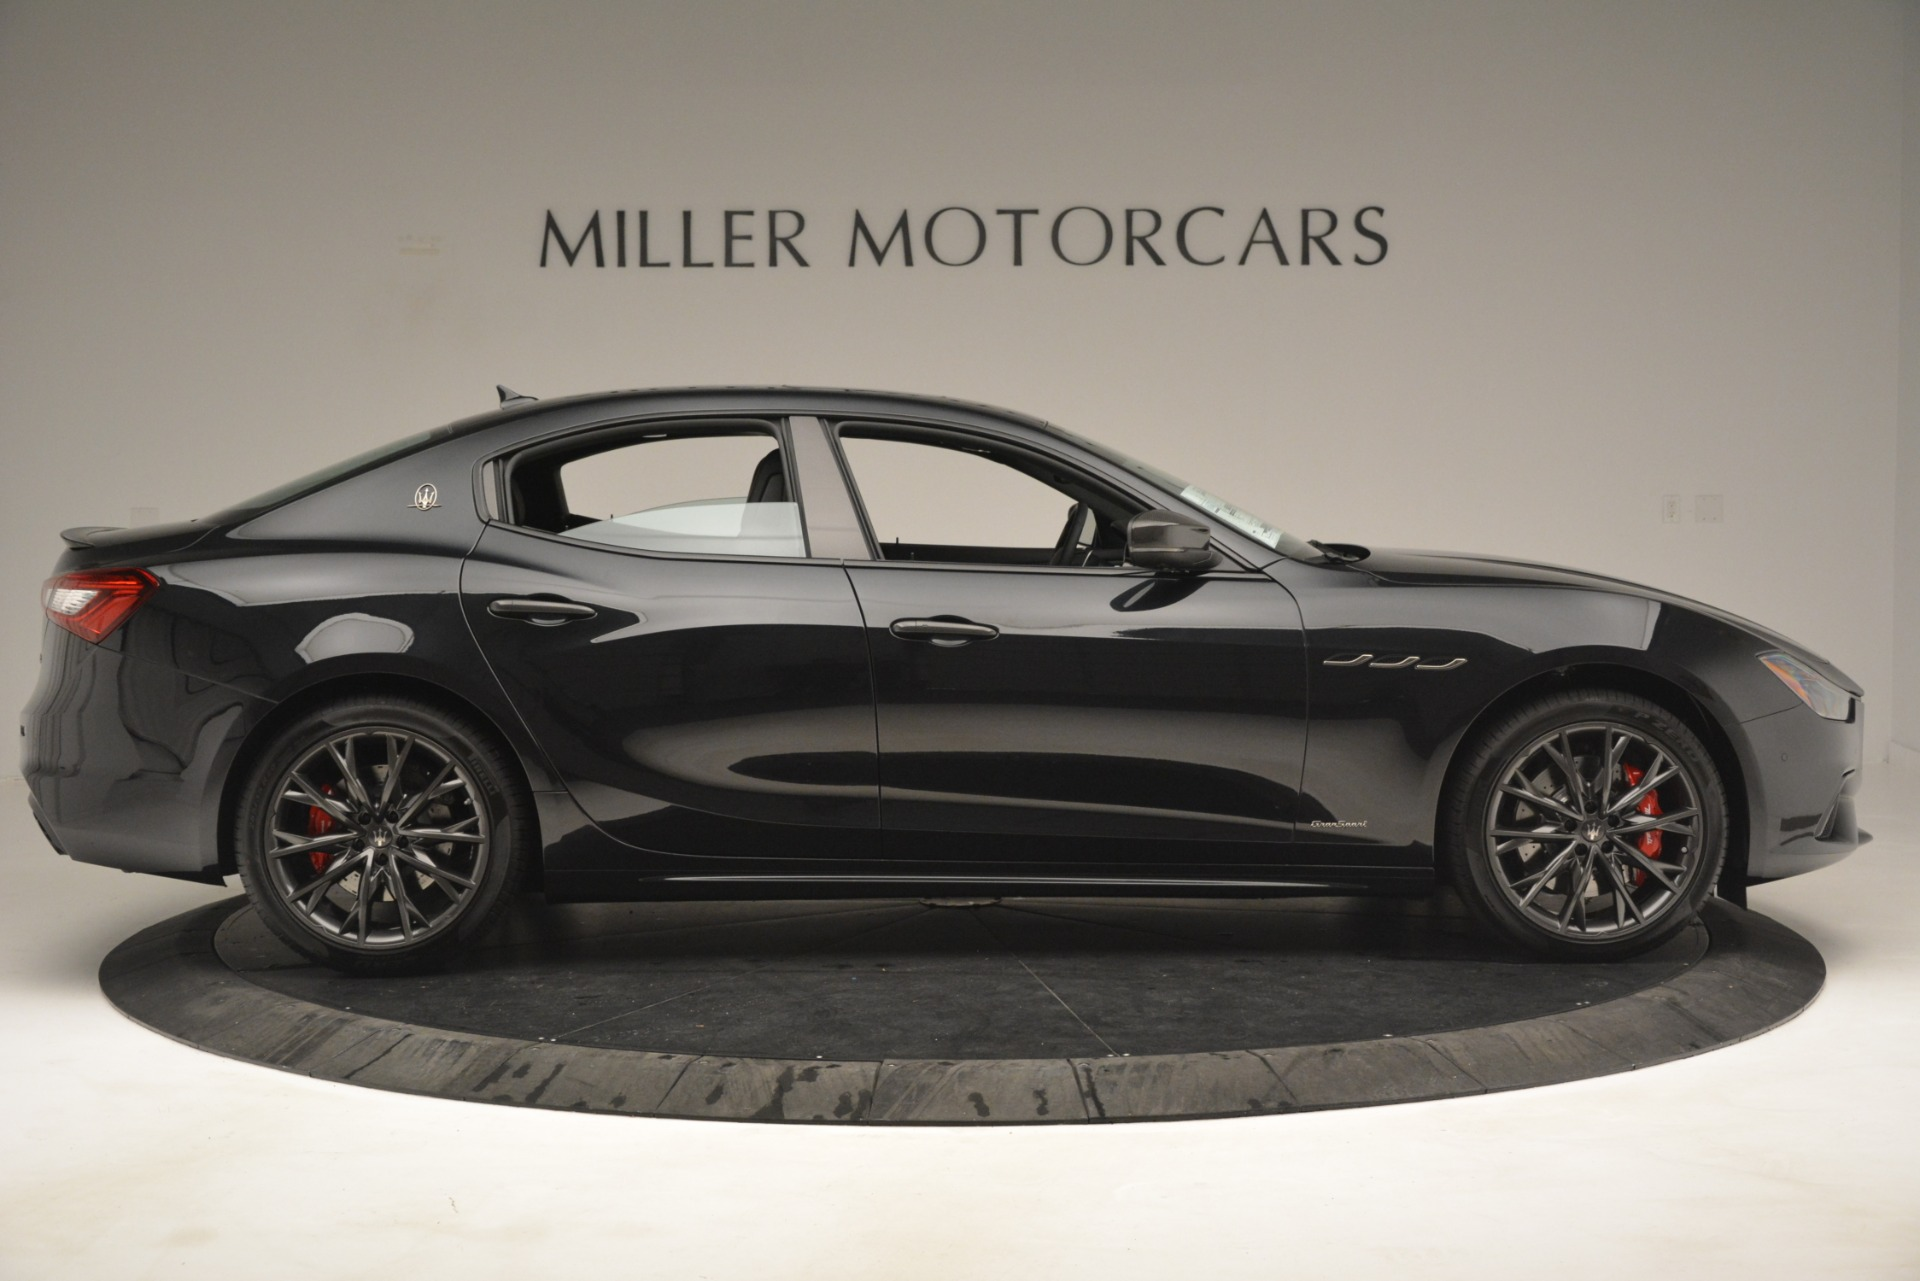 New 2019 Maserati Ghibli S Q4 GranSport For Sale In Greenwich, CT. Alfa Romeo of Greenwich, W667 2924_p9